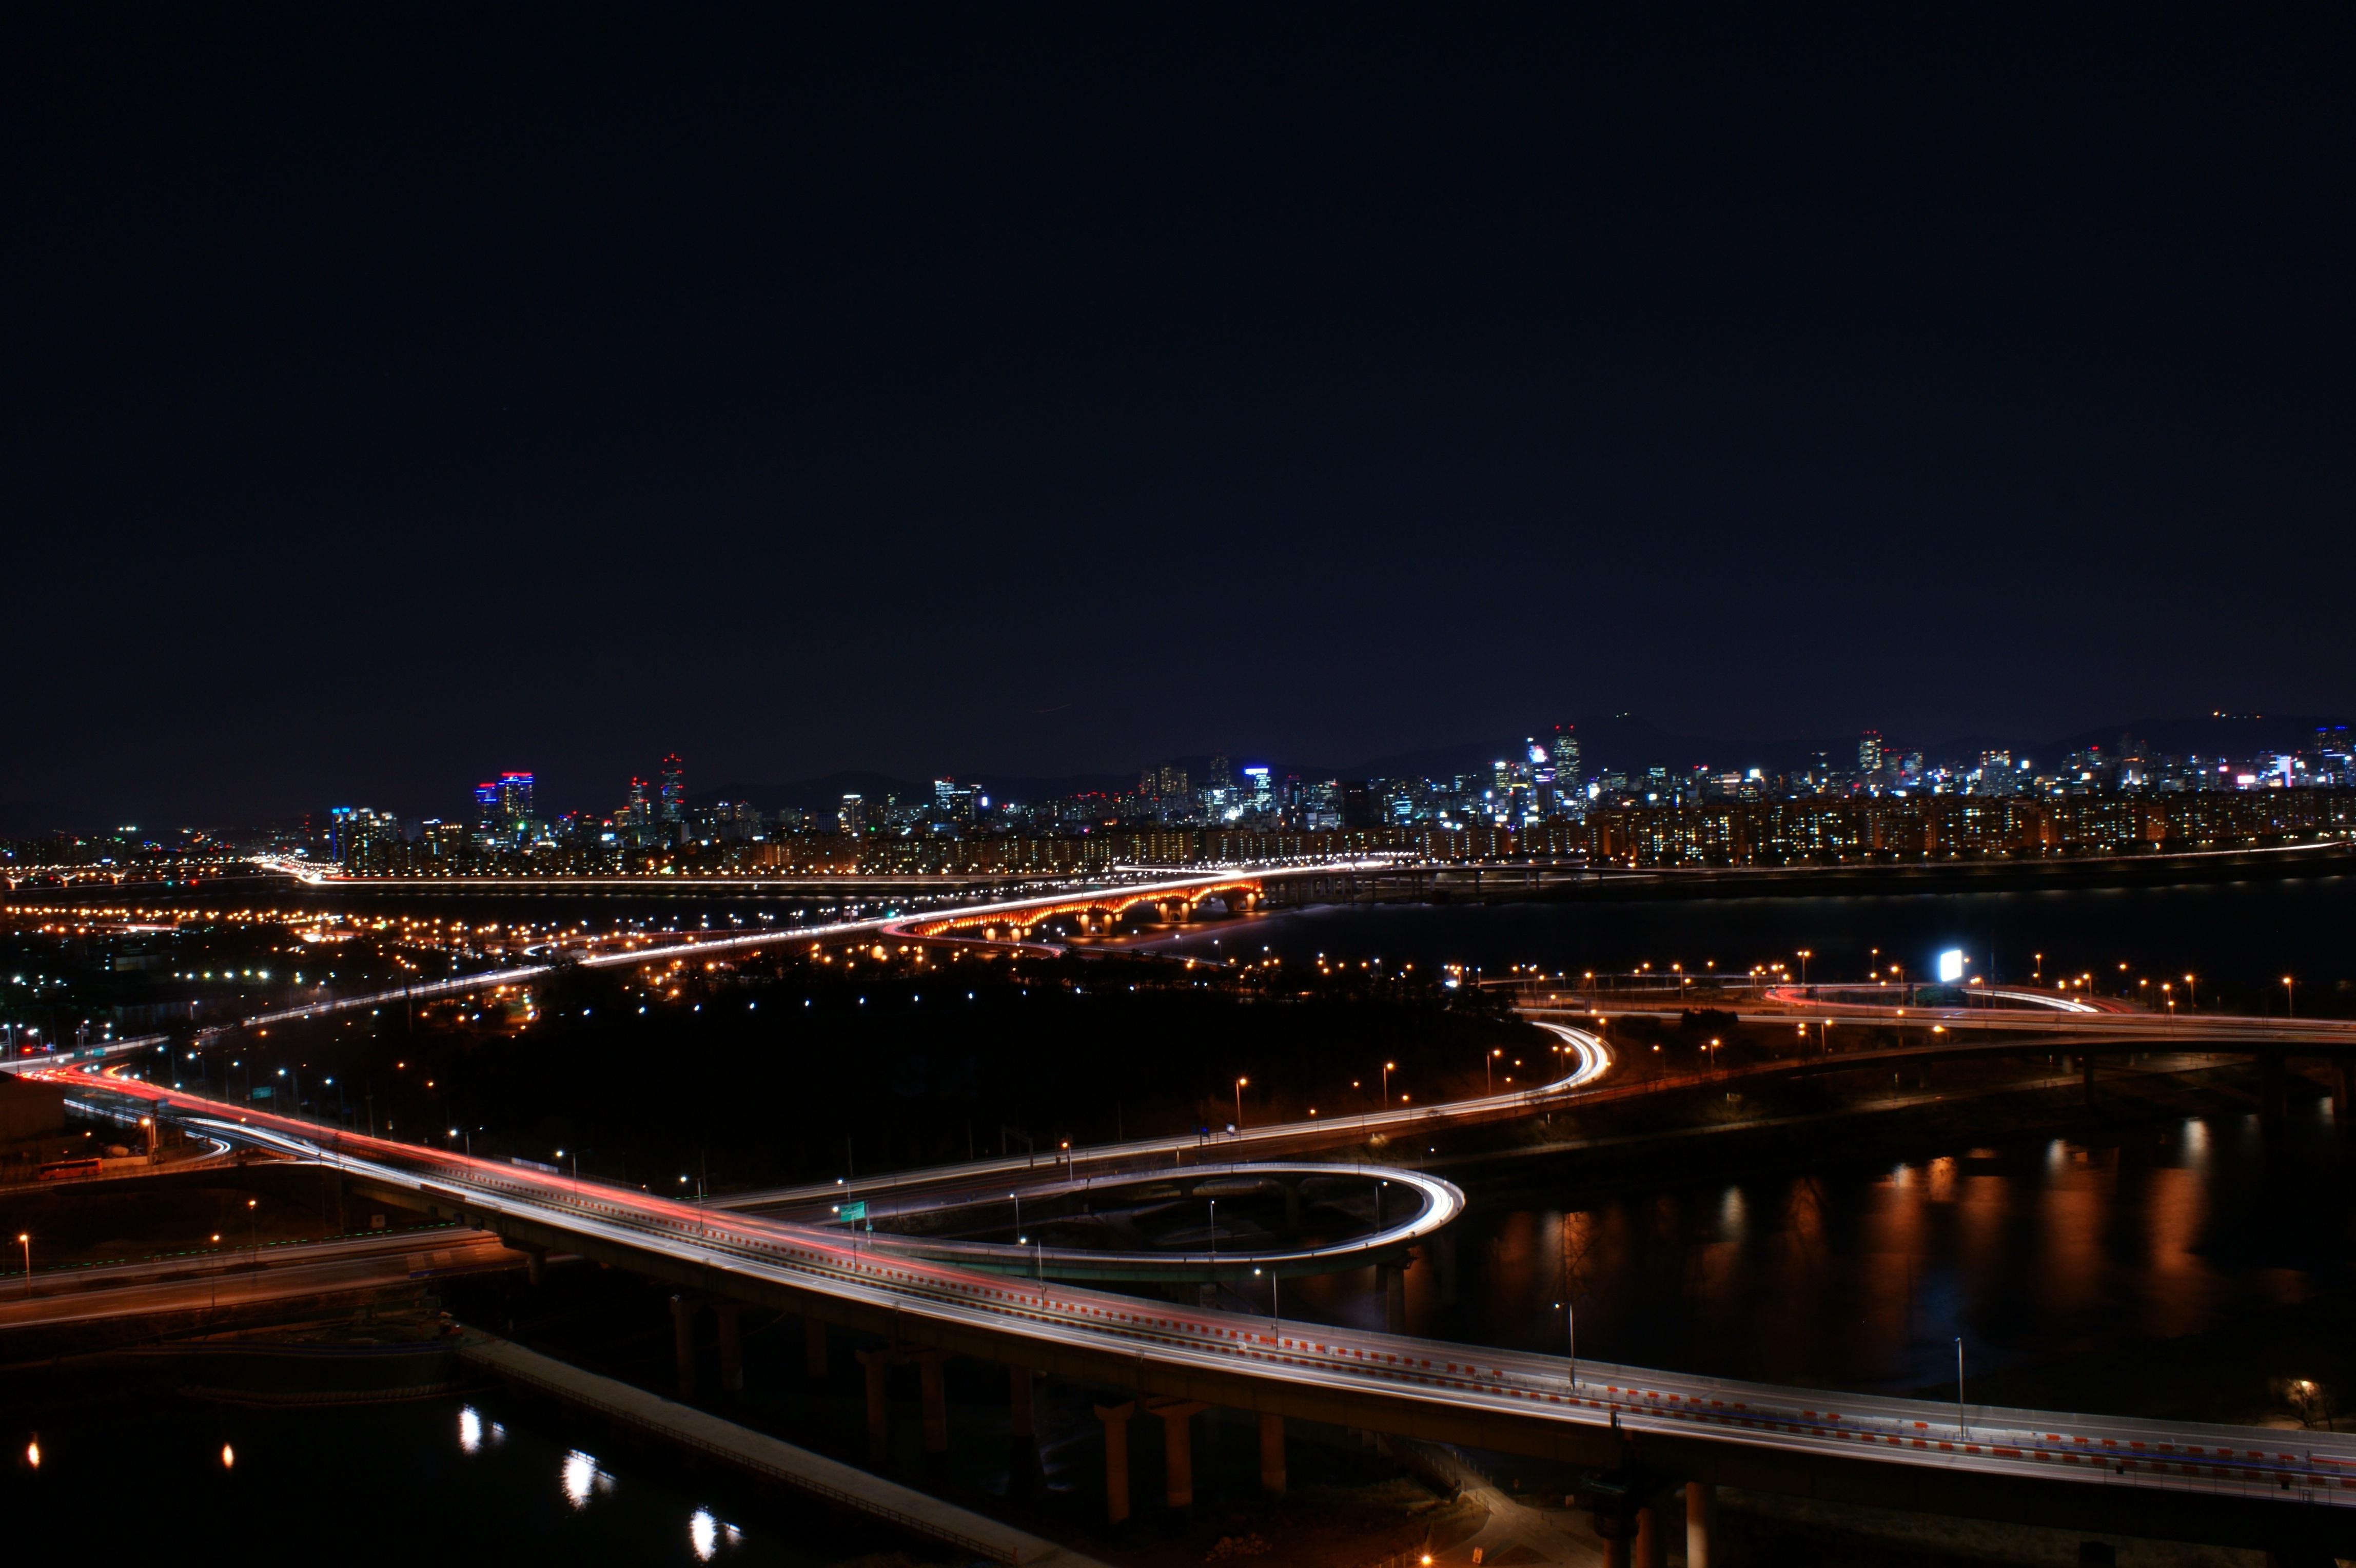 Free Images Light Structure Road Bridge Skyline Car City